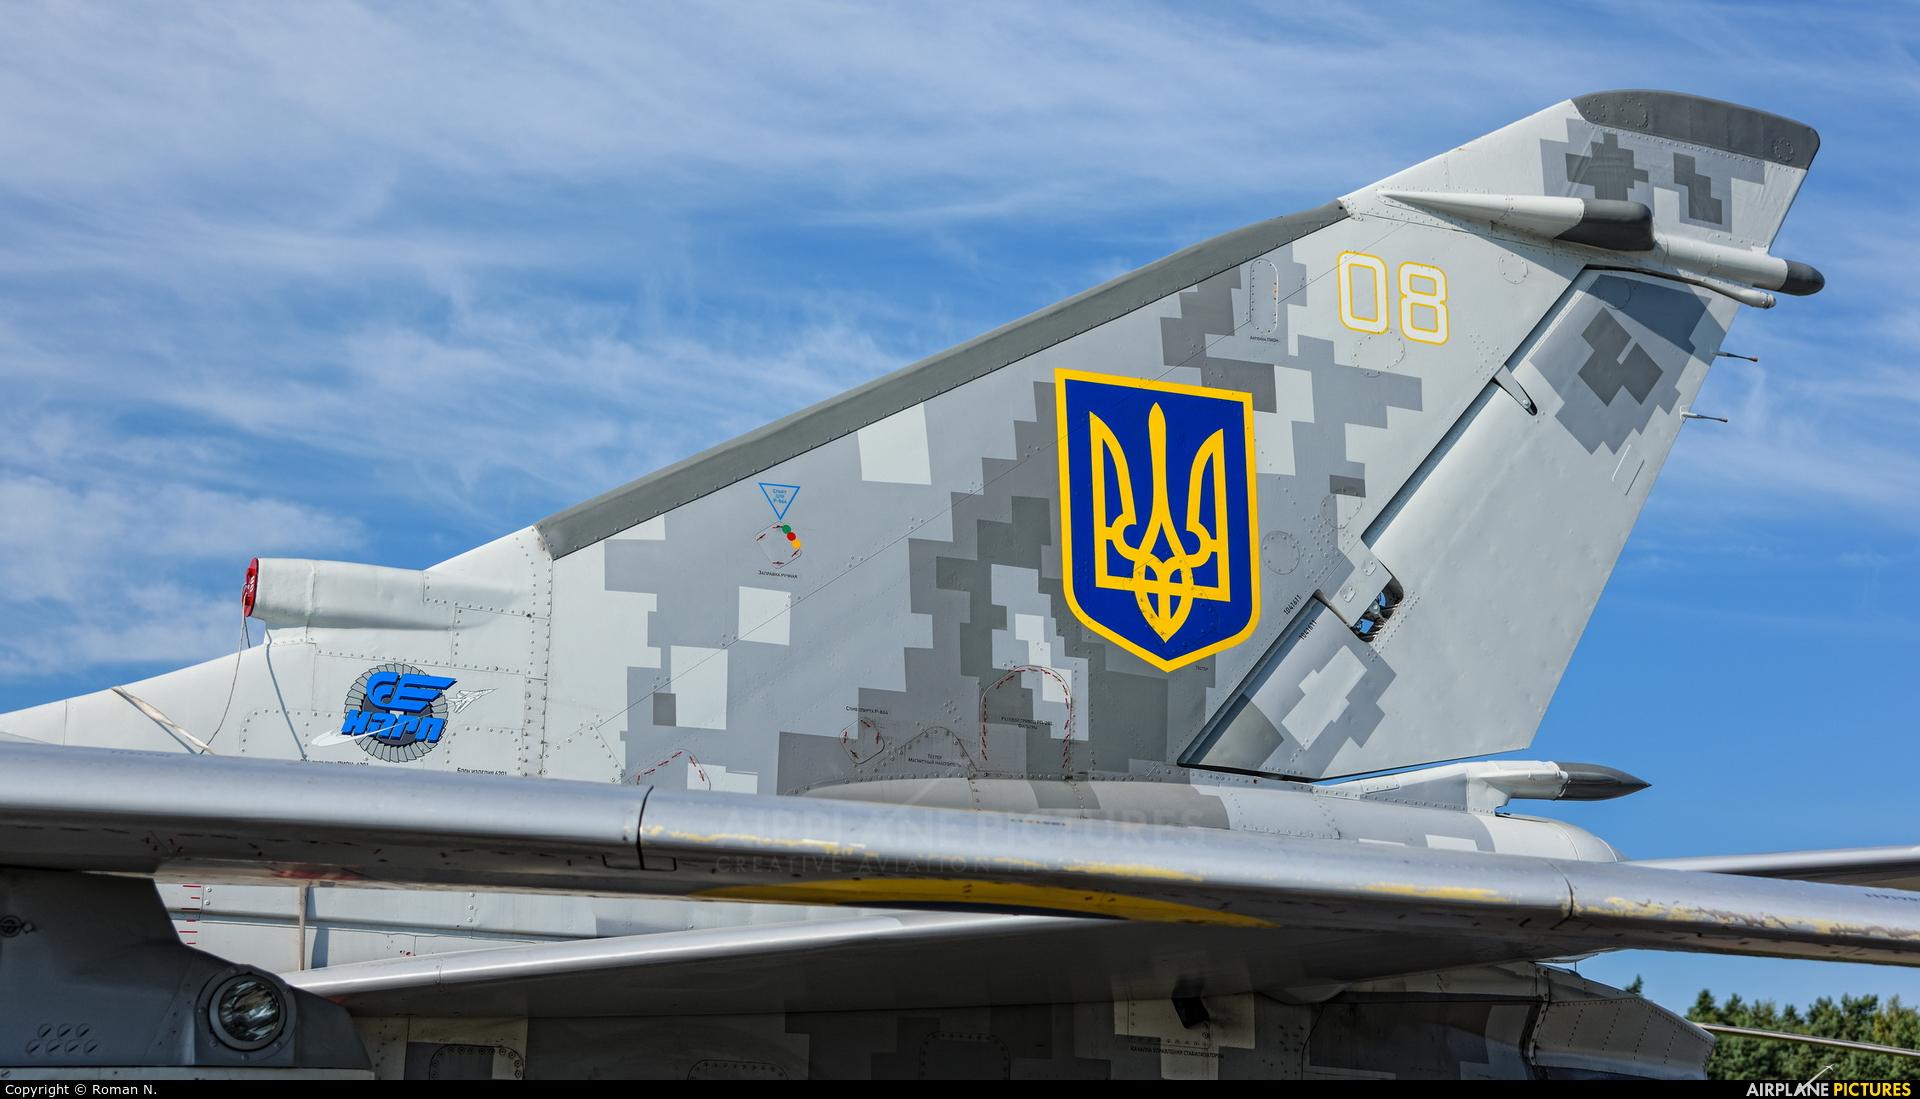 Ukraine - Air Force 08 aircraft at Gdynia- Babie Doły (Oksywie)